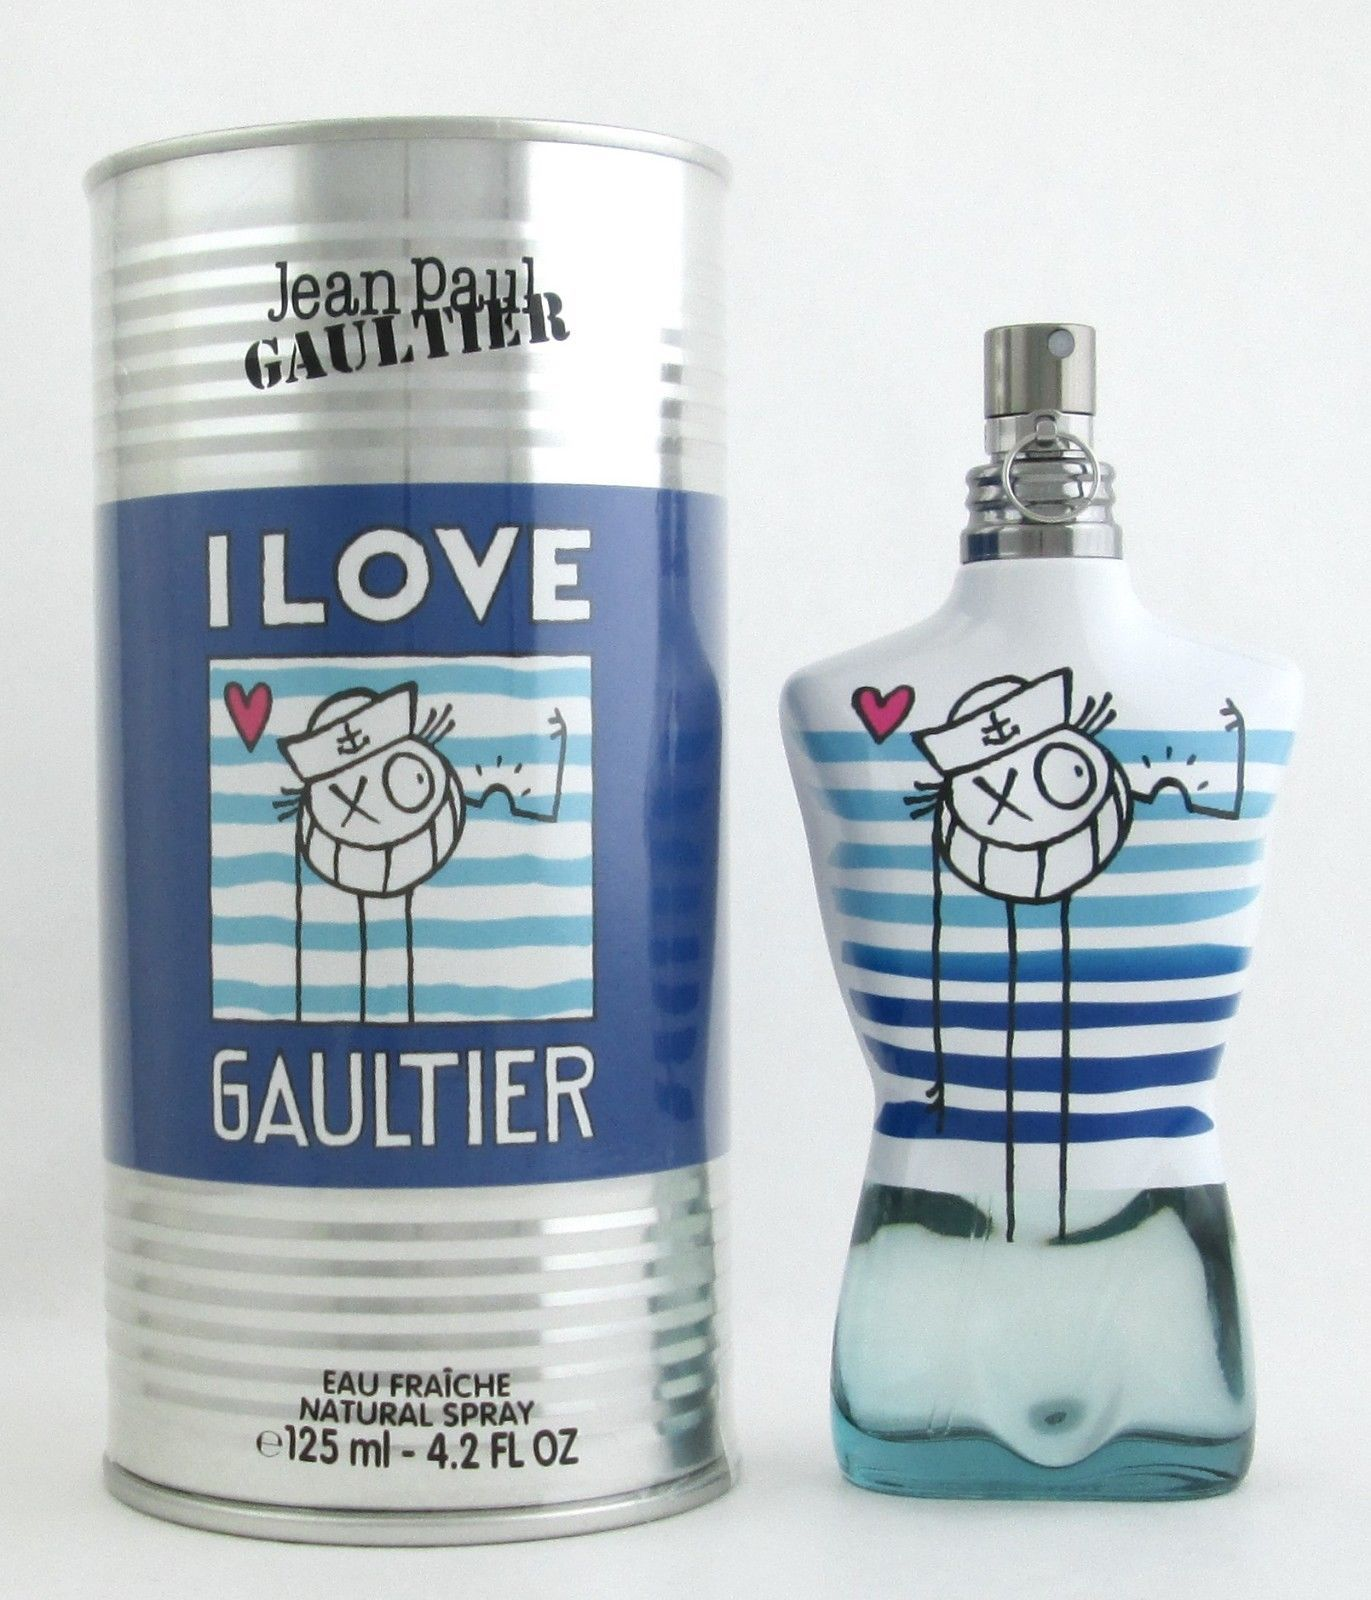 61 99 Le Male I Love Gautlier Cologne Jean Paul Gautlier 4 2 Oz Eau Fraiche Spray Men Gautlier Cologne Fraiche Care Antia Jean Paul Fraiche My Love